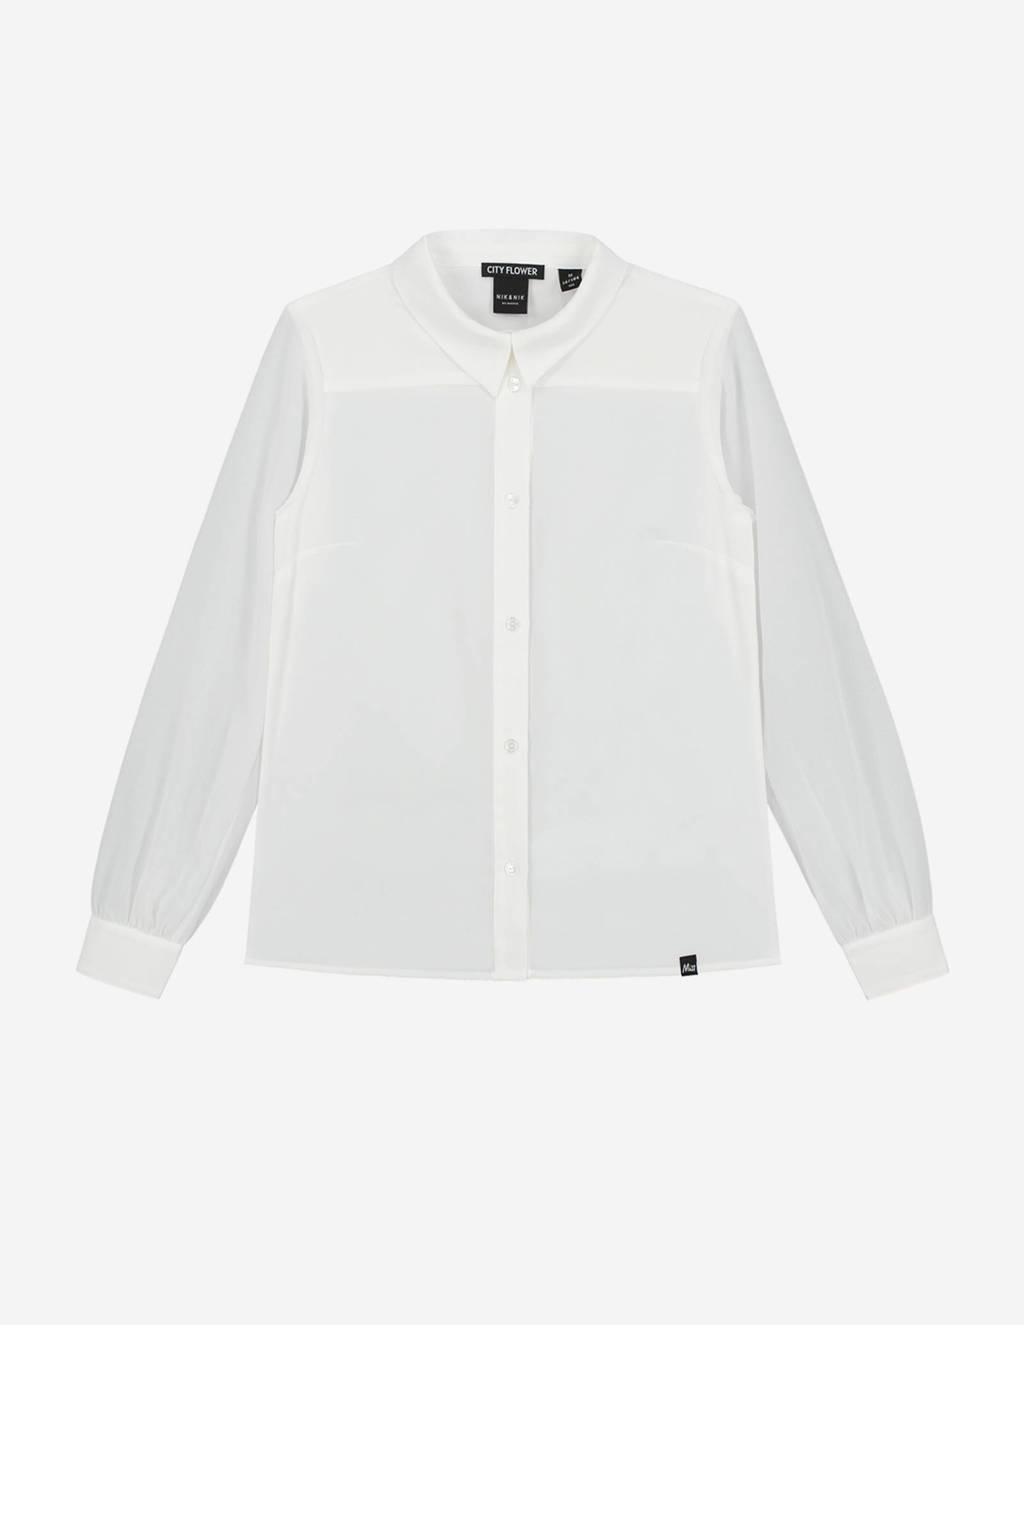 NIK&NIK blouse Octavia met strik van gerecycled polyester off white, Off White